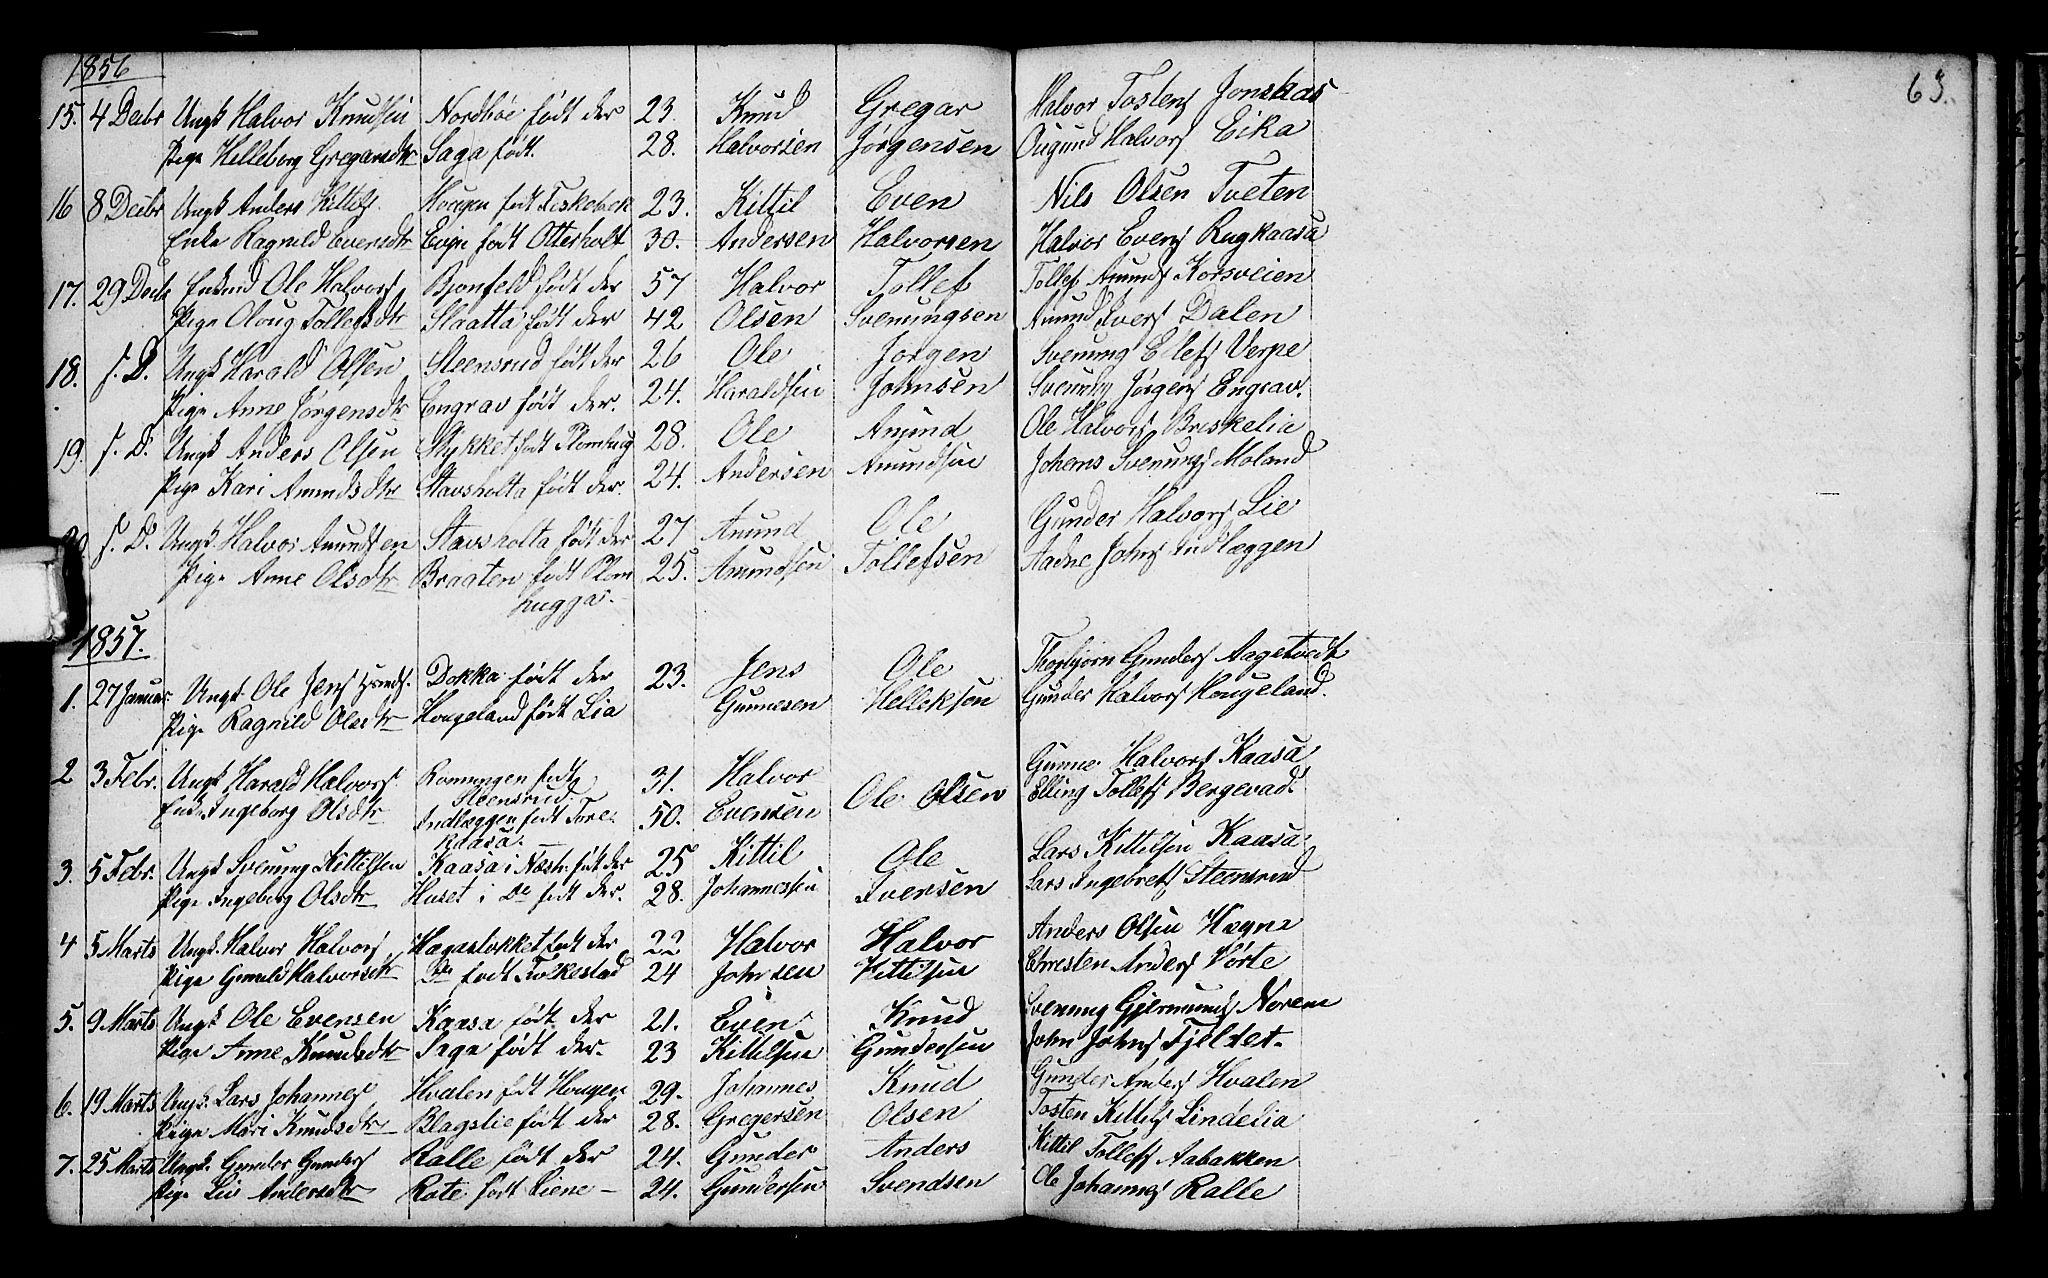 SAKO, Bø kirkebøker, G/Ga/L0002: Klokkerbok nr. 2, 1853-1866, s. 63